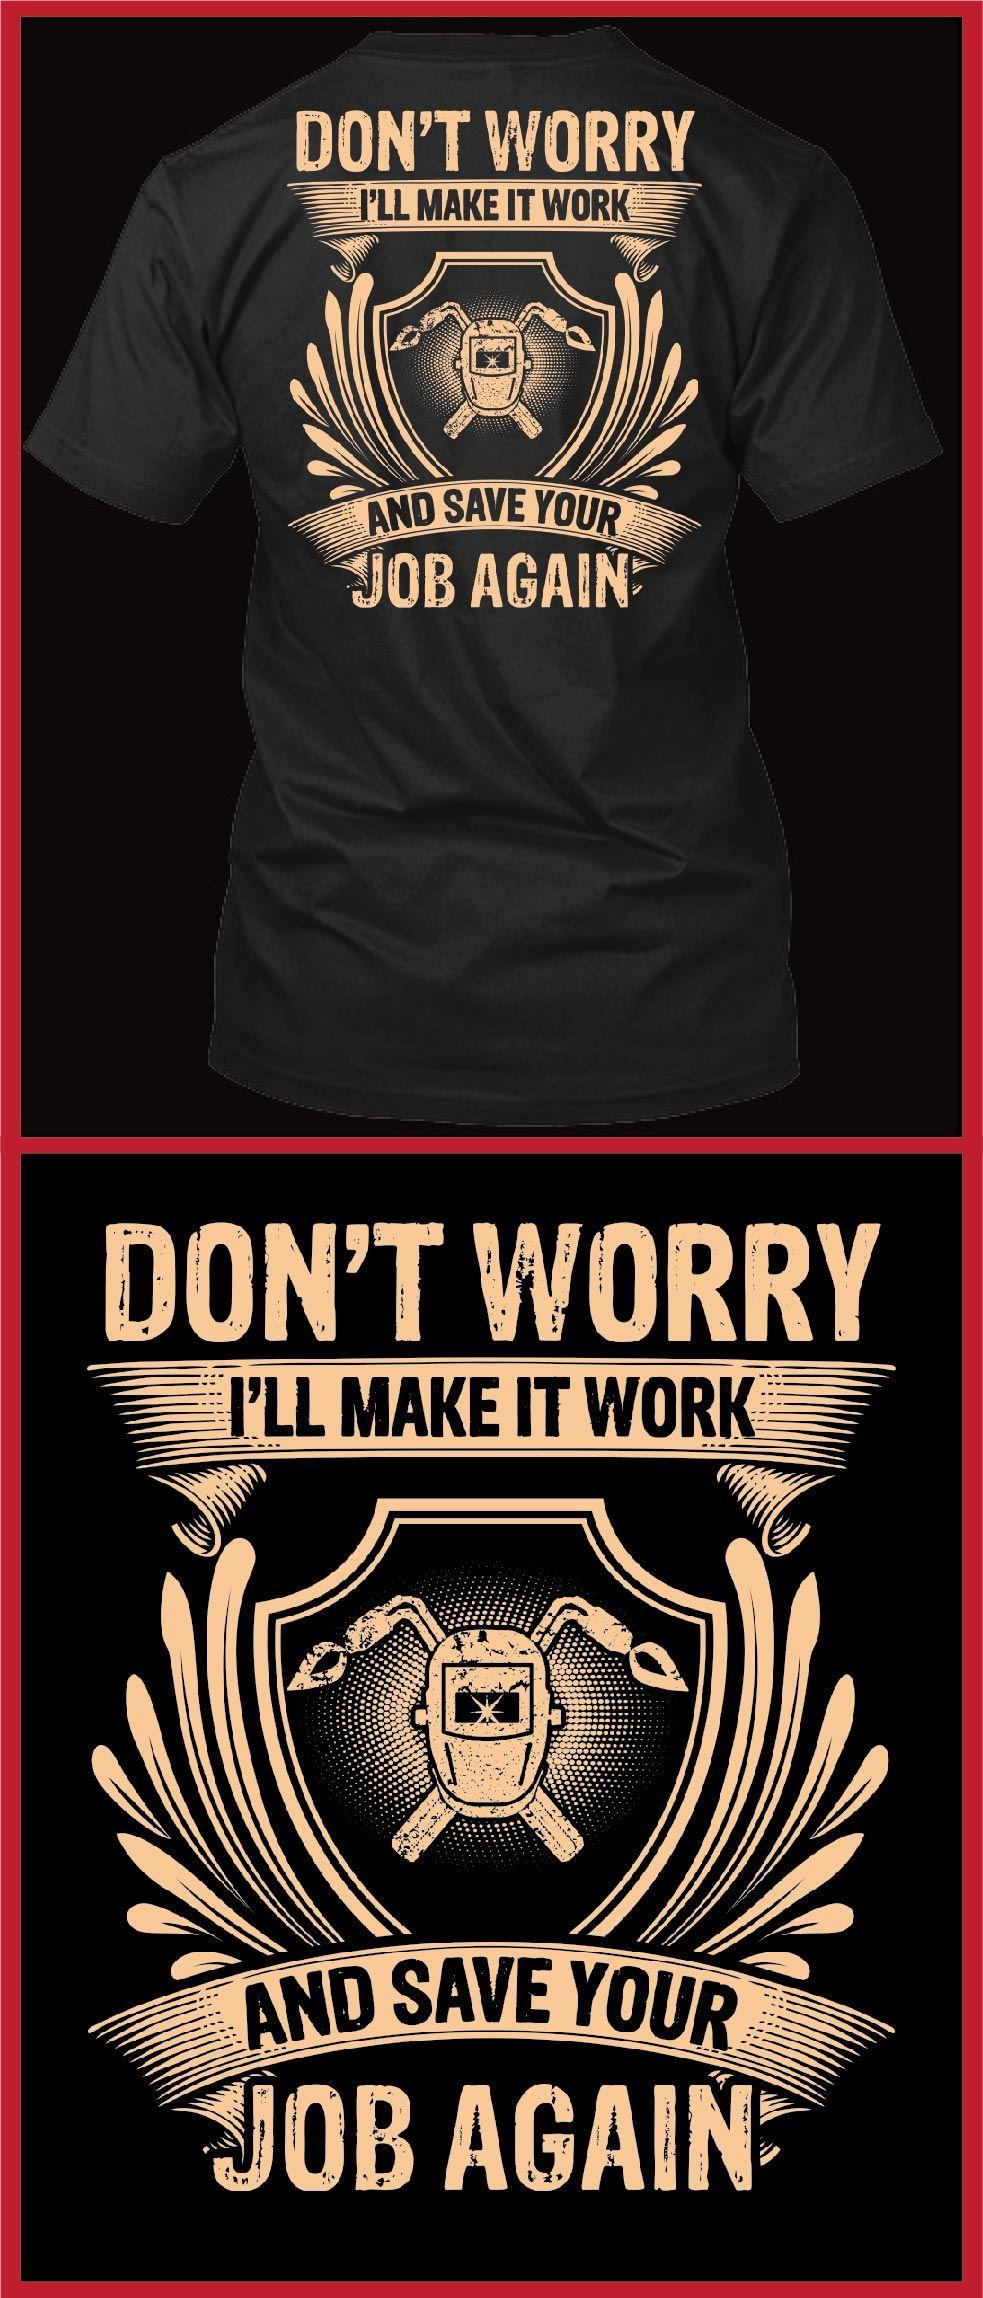 857db73d5 Welder Gifts,Funny welding t shirts,welder hoodies,welder shirts,welder  memes,welder quotes,Welder Gifts.